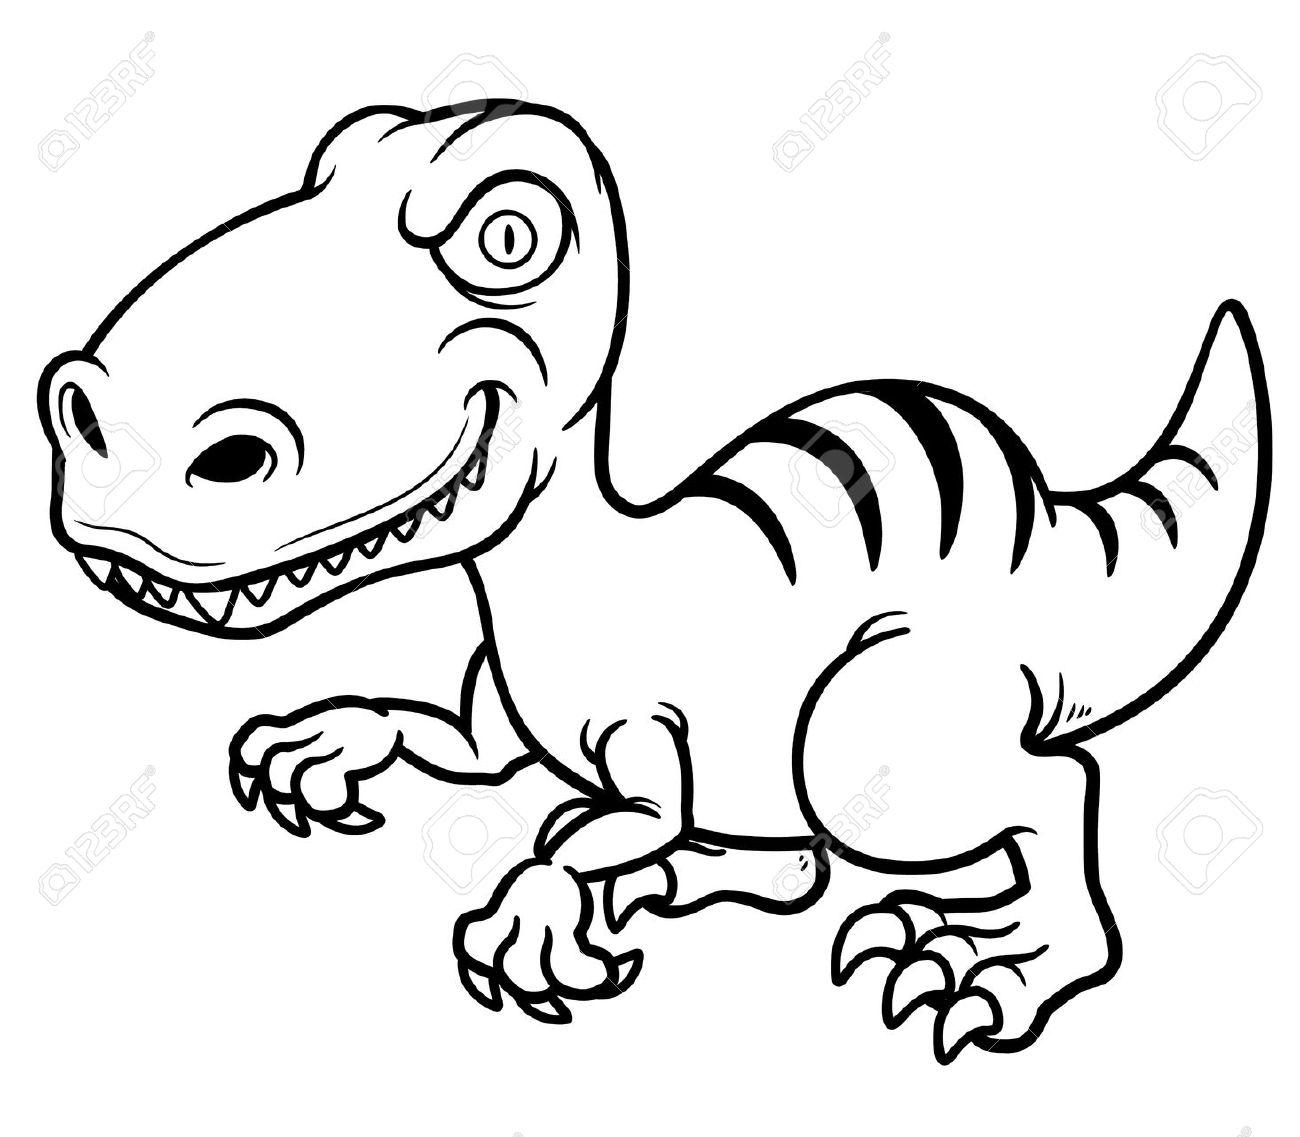 1300x1137 Dinosaur Drawing Book Tags Dinosaur Cartoon Drawing Dinosaur